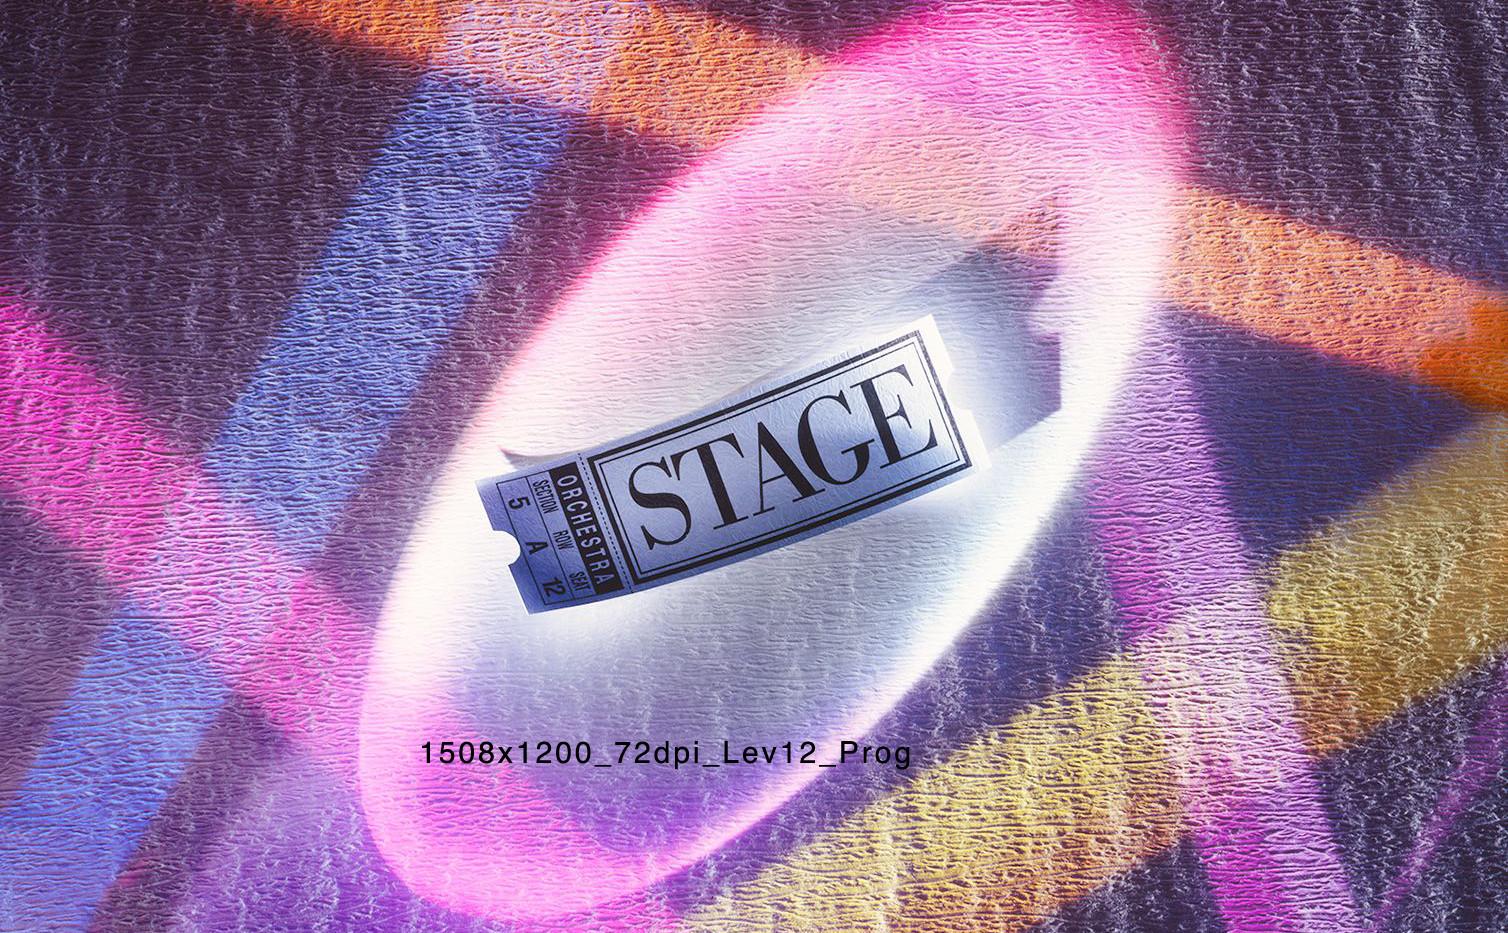 1508x1200_72dpi_Lev12_Prog copy.JPG